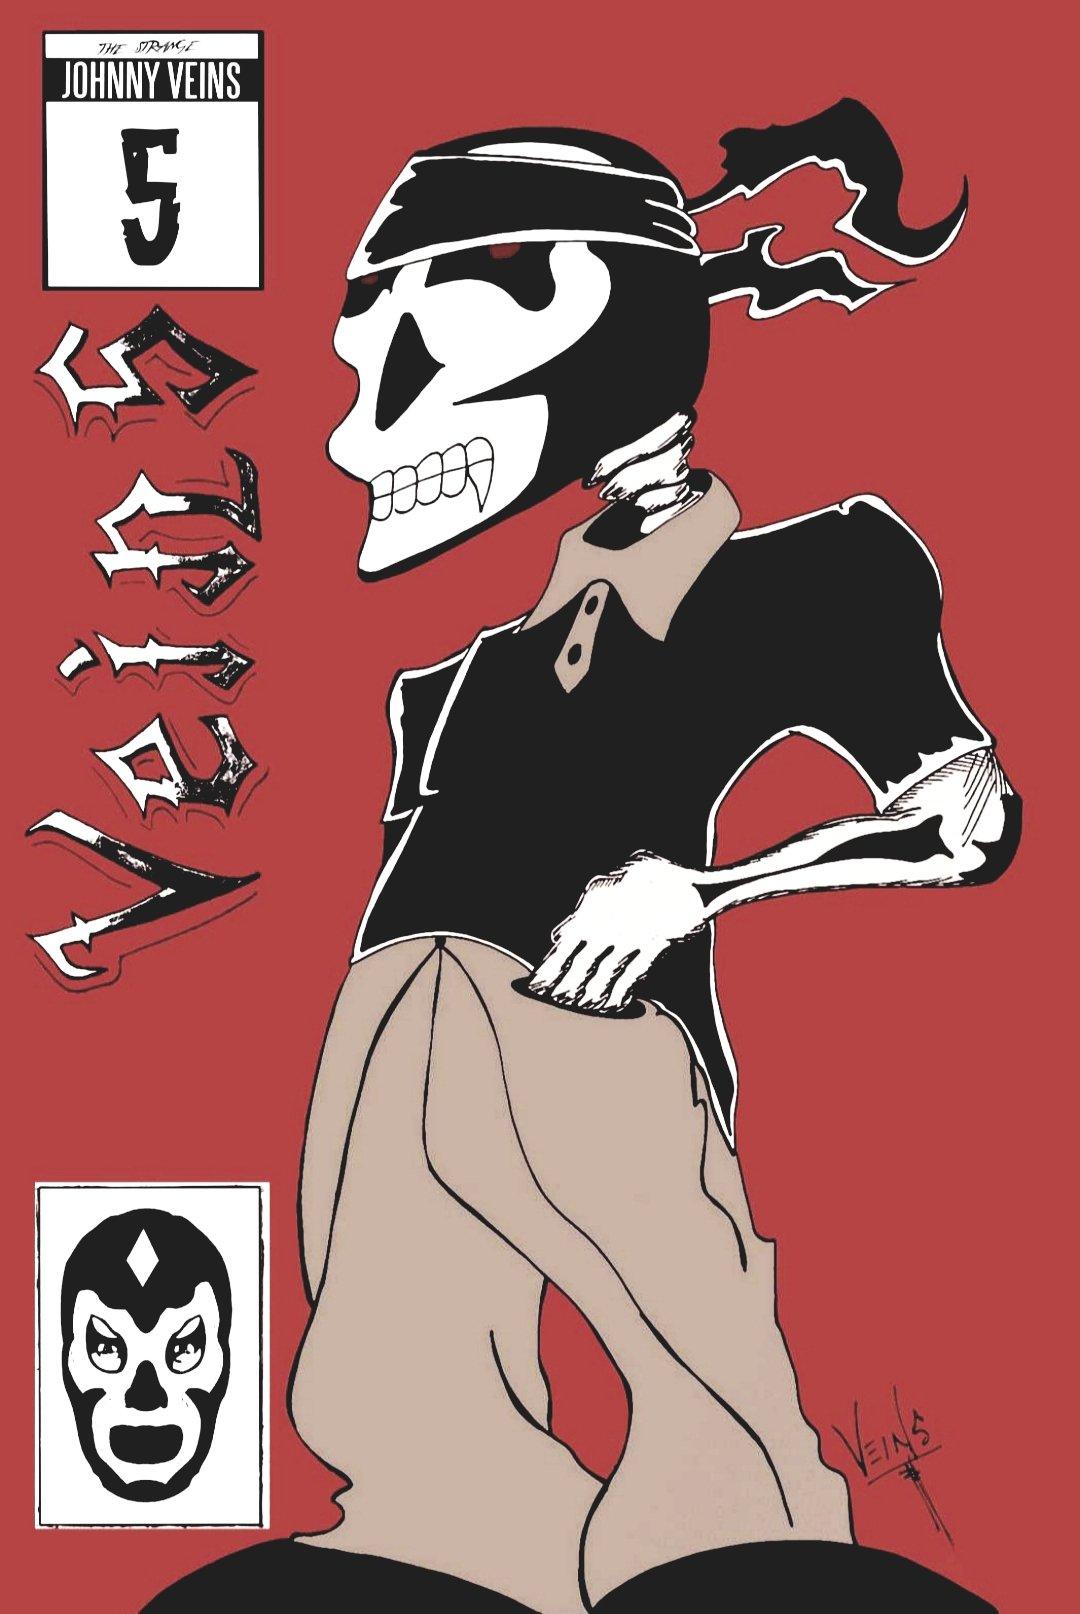 The Strange Johnny Veins #5